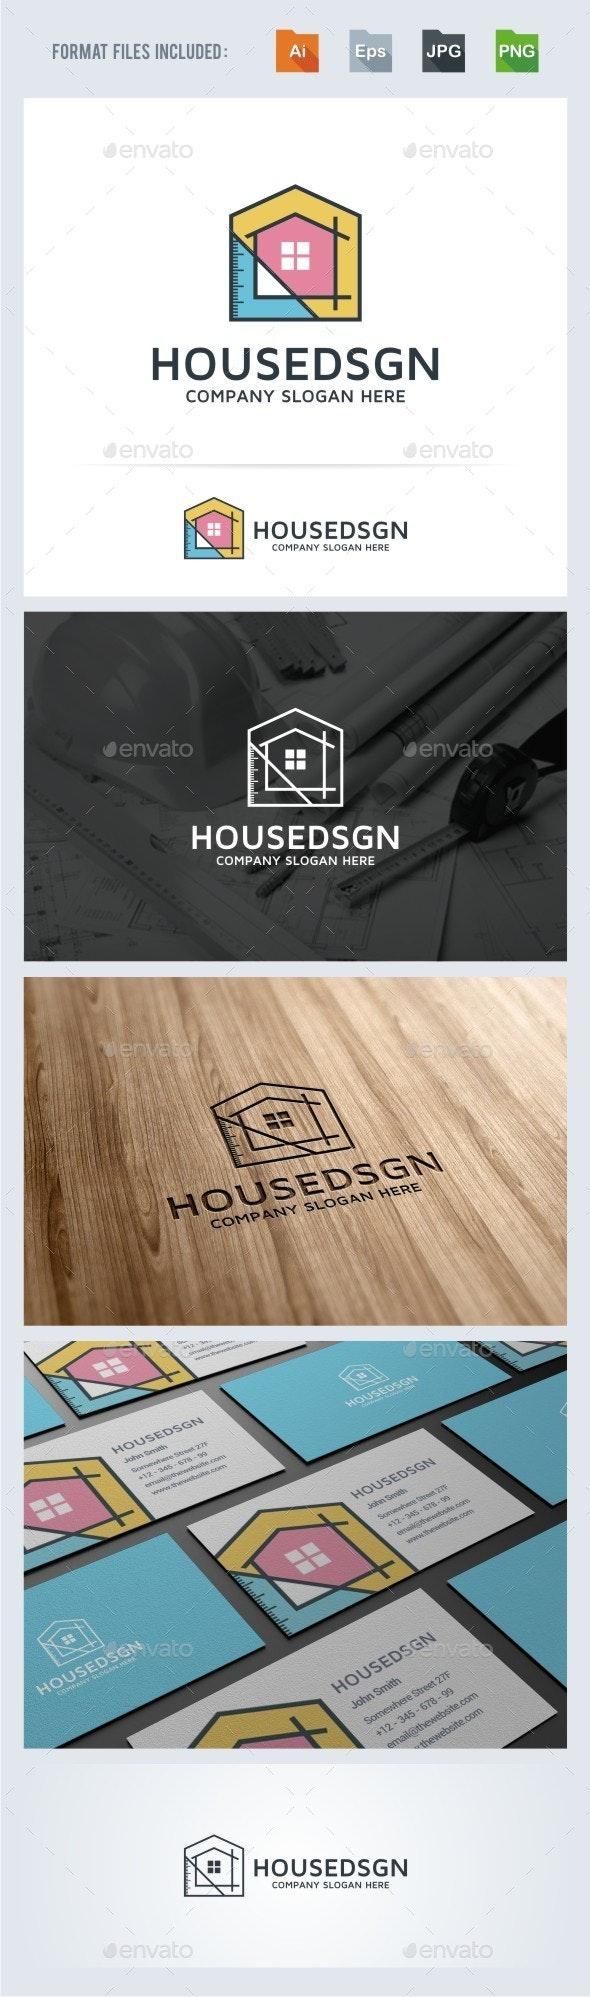 House Design - Architecture Logo Template - Buildings Logo Templates